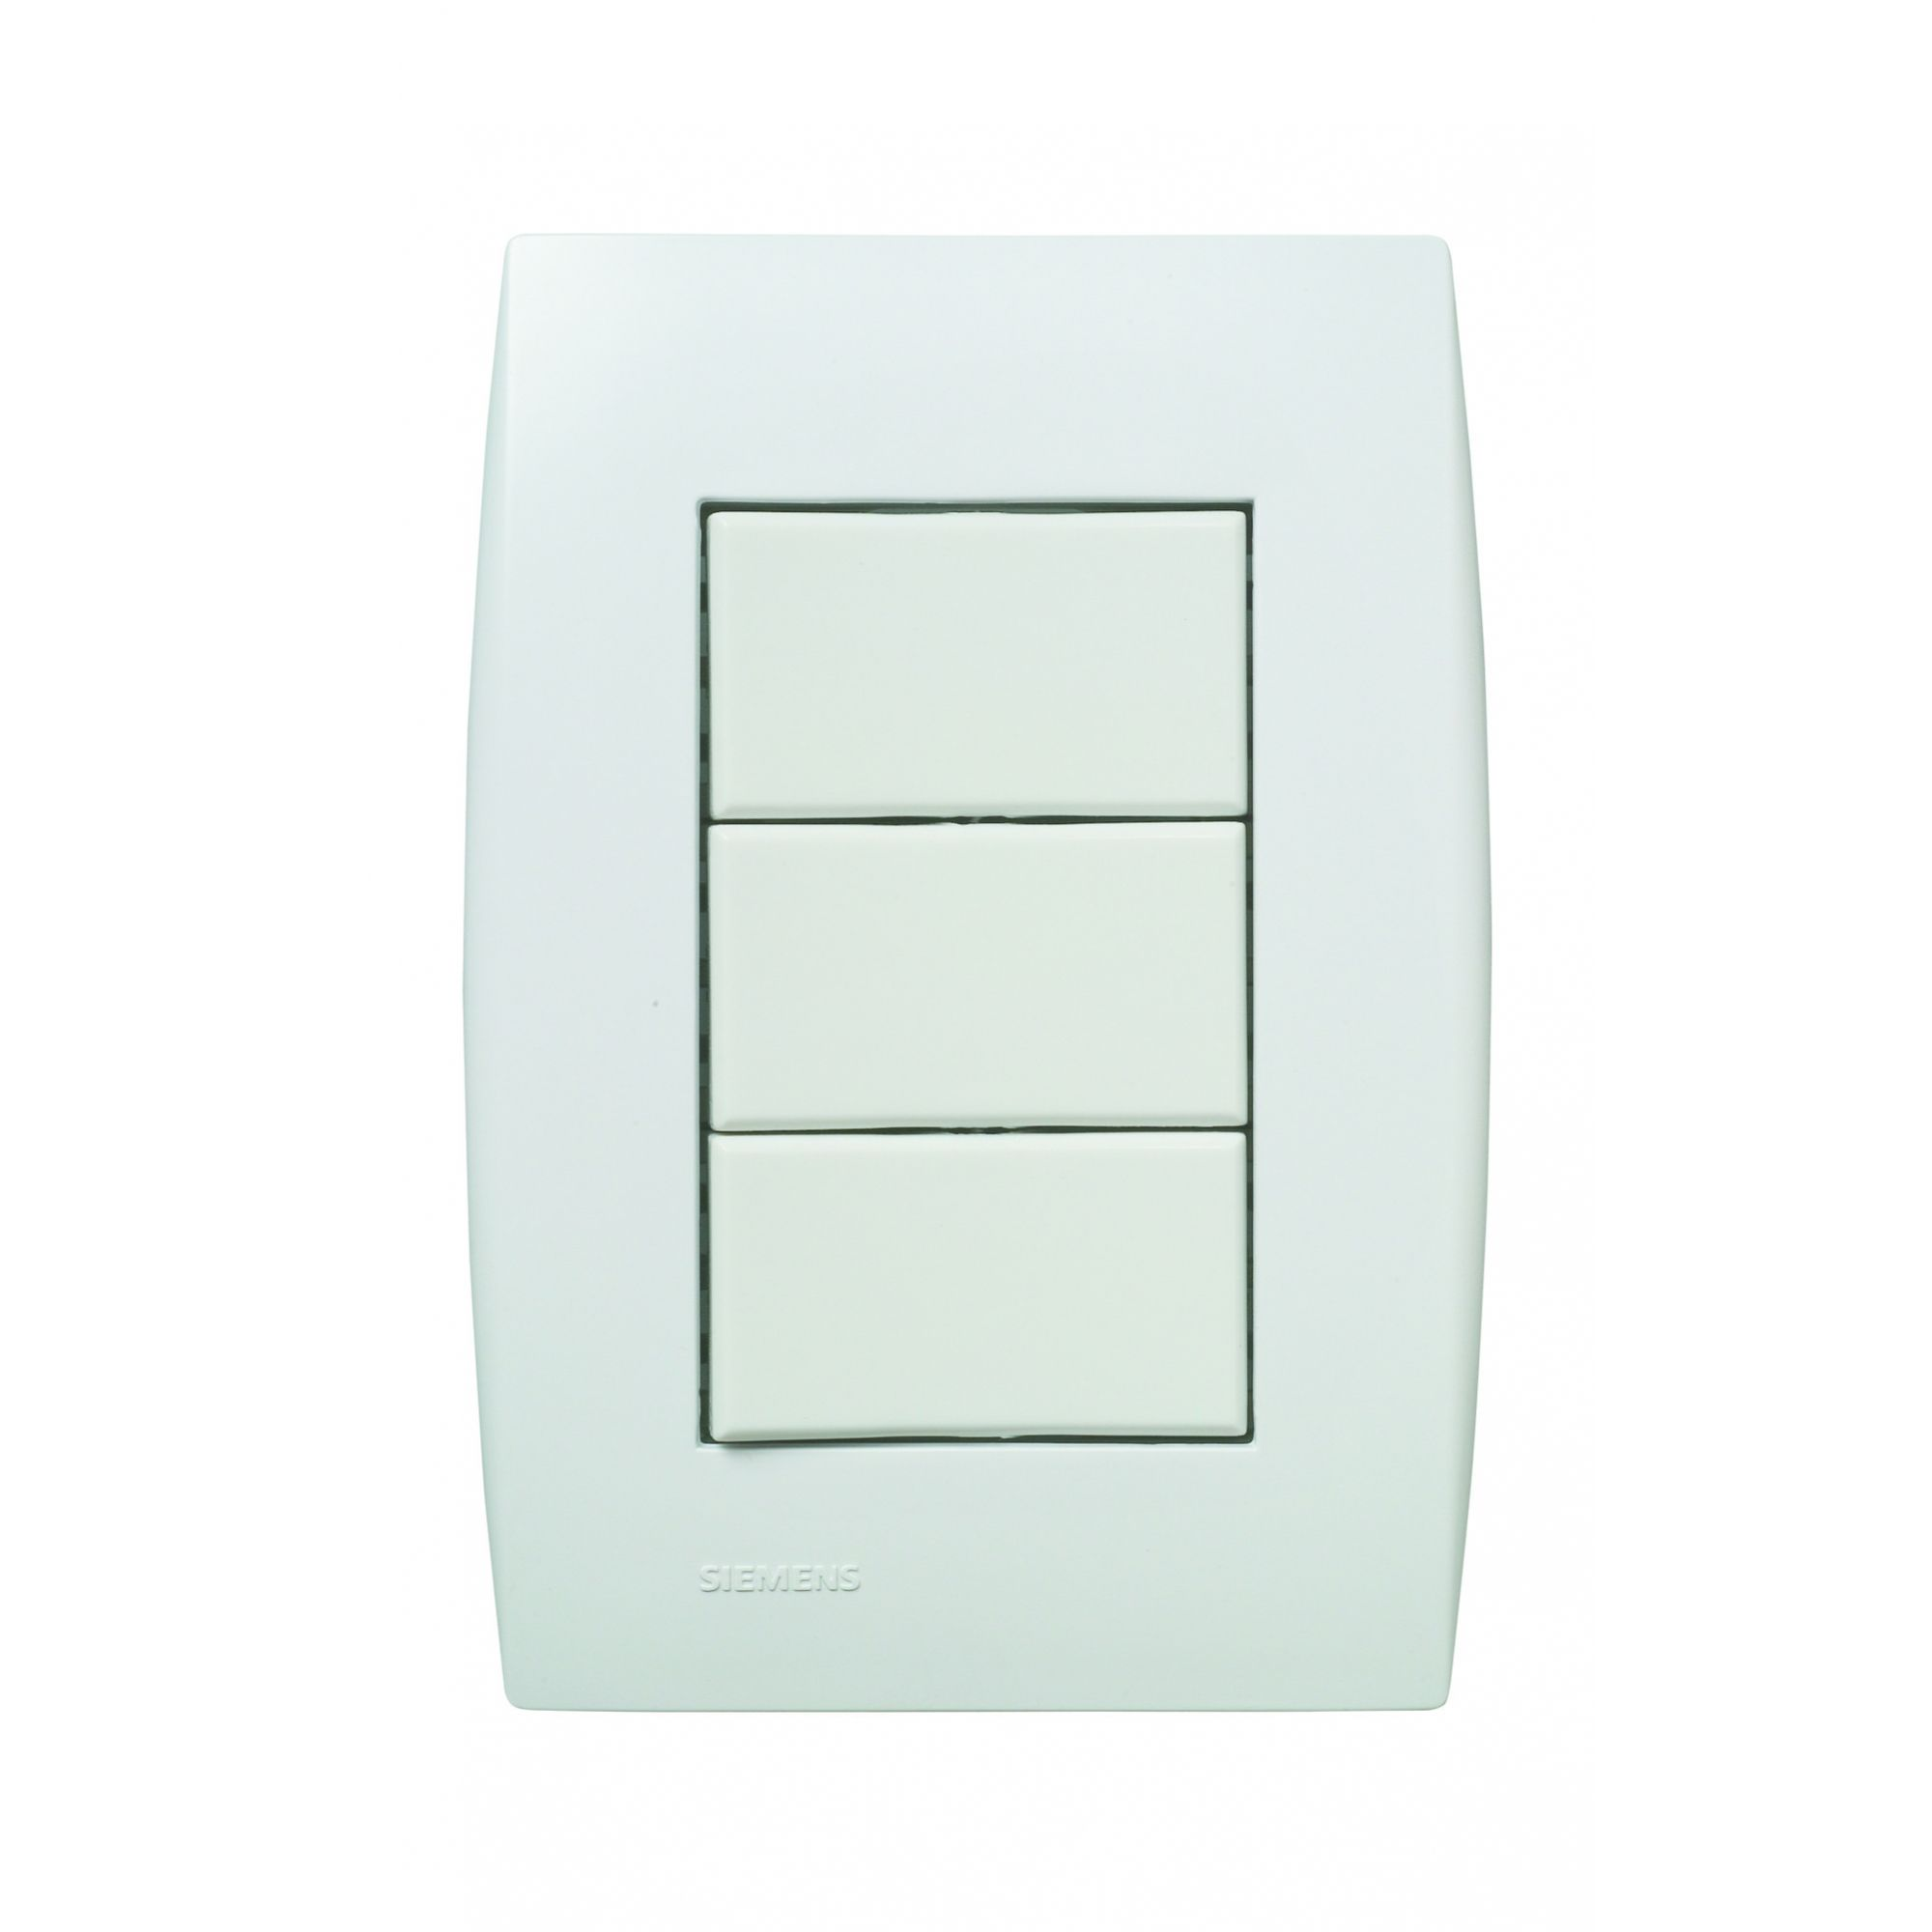 3 Interruptores Paralelos – Ilus 5TA9 9052 - Siemens